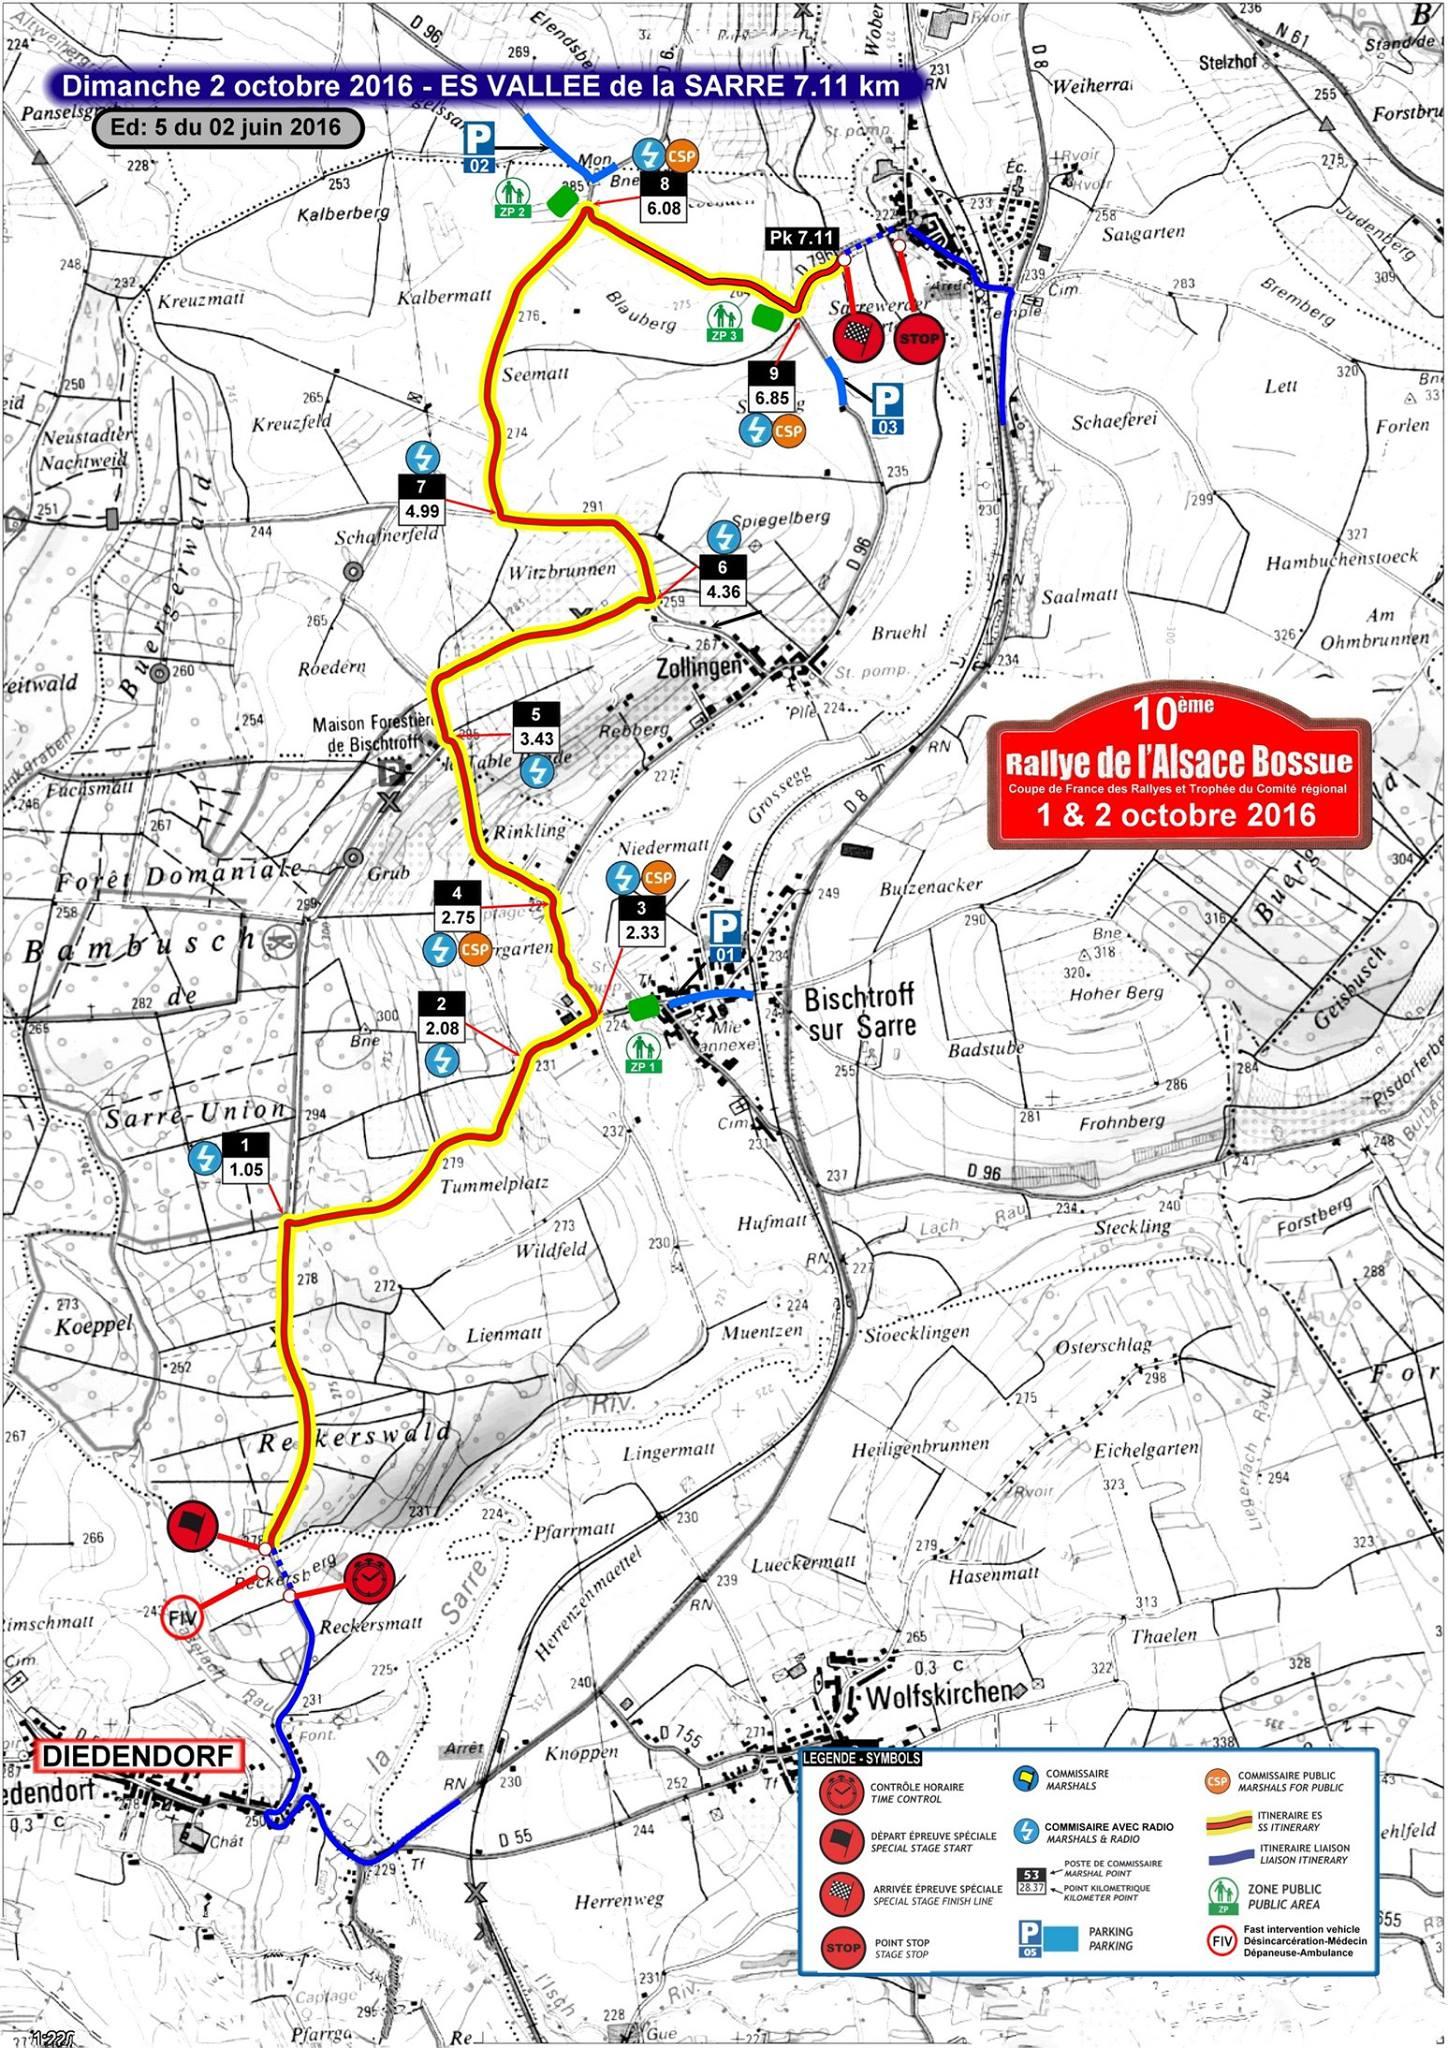 Carte Alsace Bossue.Rallye Alsace Bossue 2016